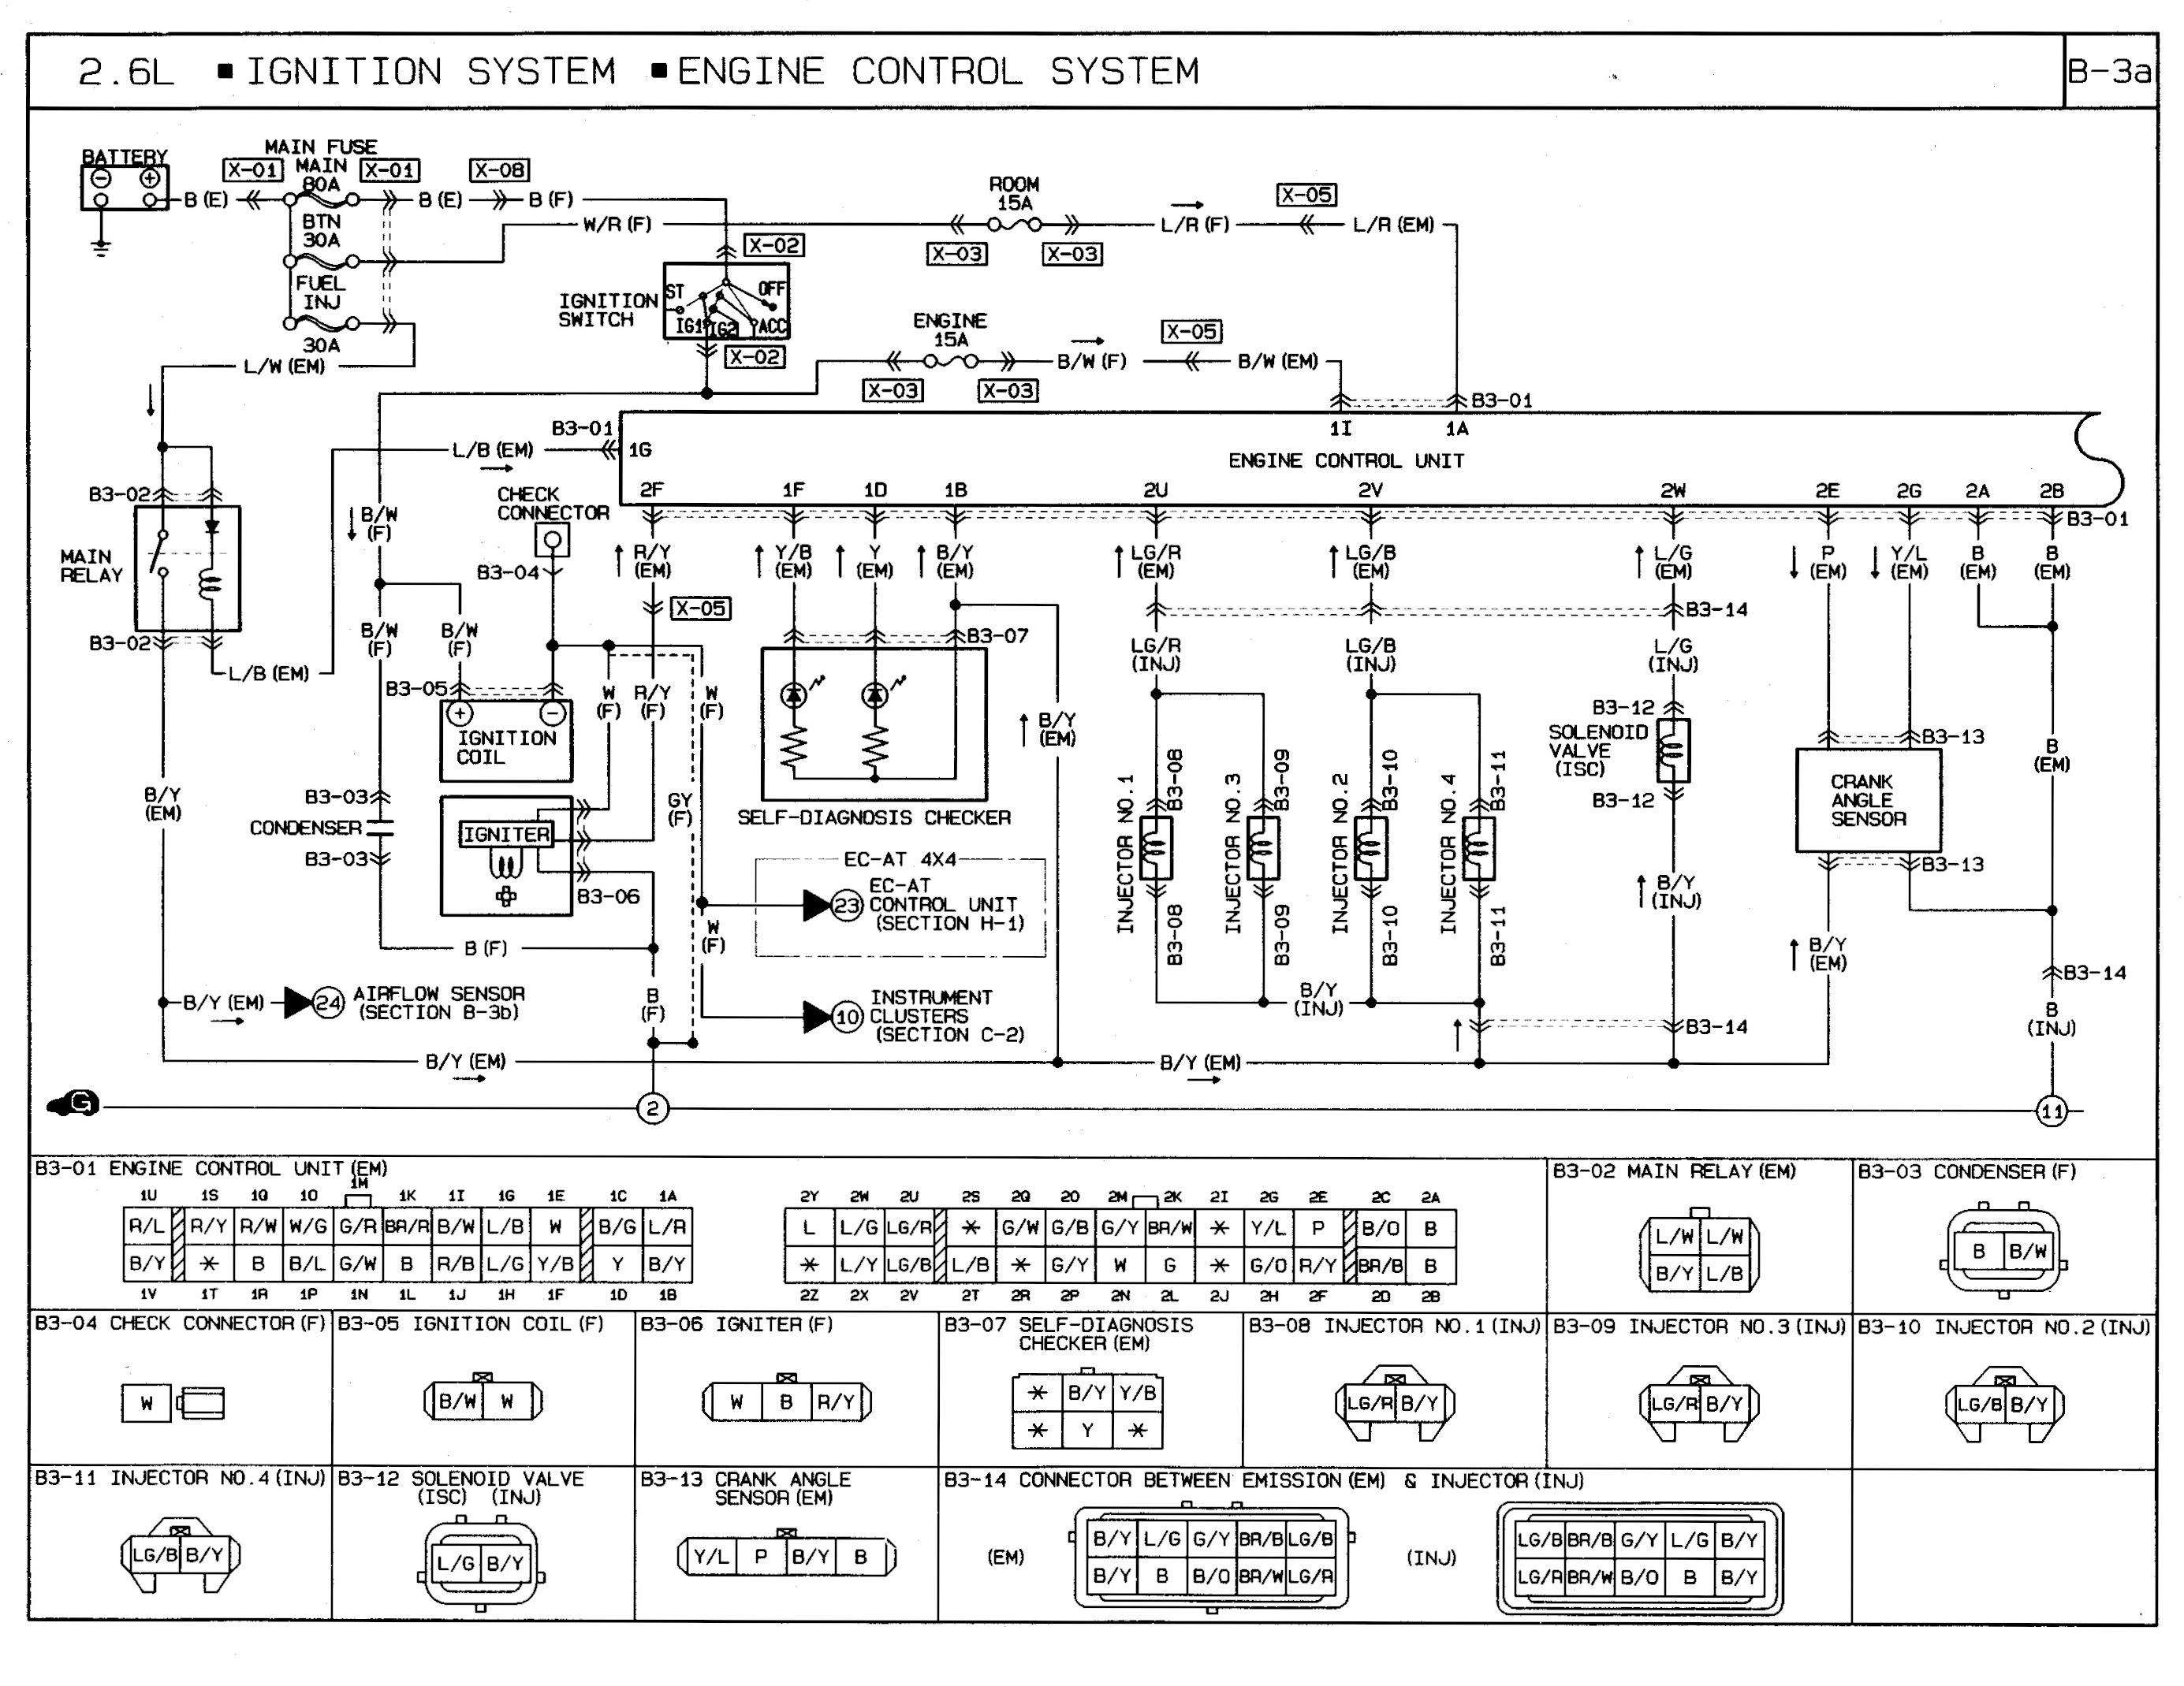 89 mazda b2200 ignition diagram - wiring diagram data main fuse box in a 1990 b2200 location honda cb750 wiring diagram 8.pa.tennisabtlg-tus-erfenbach.de